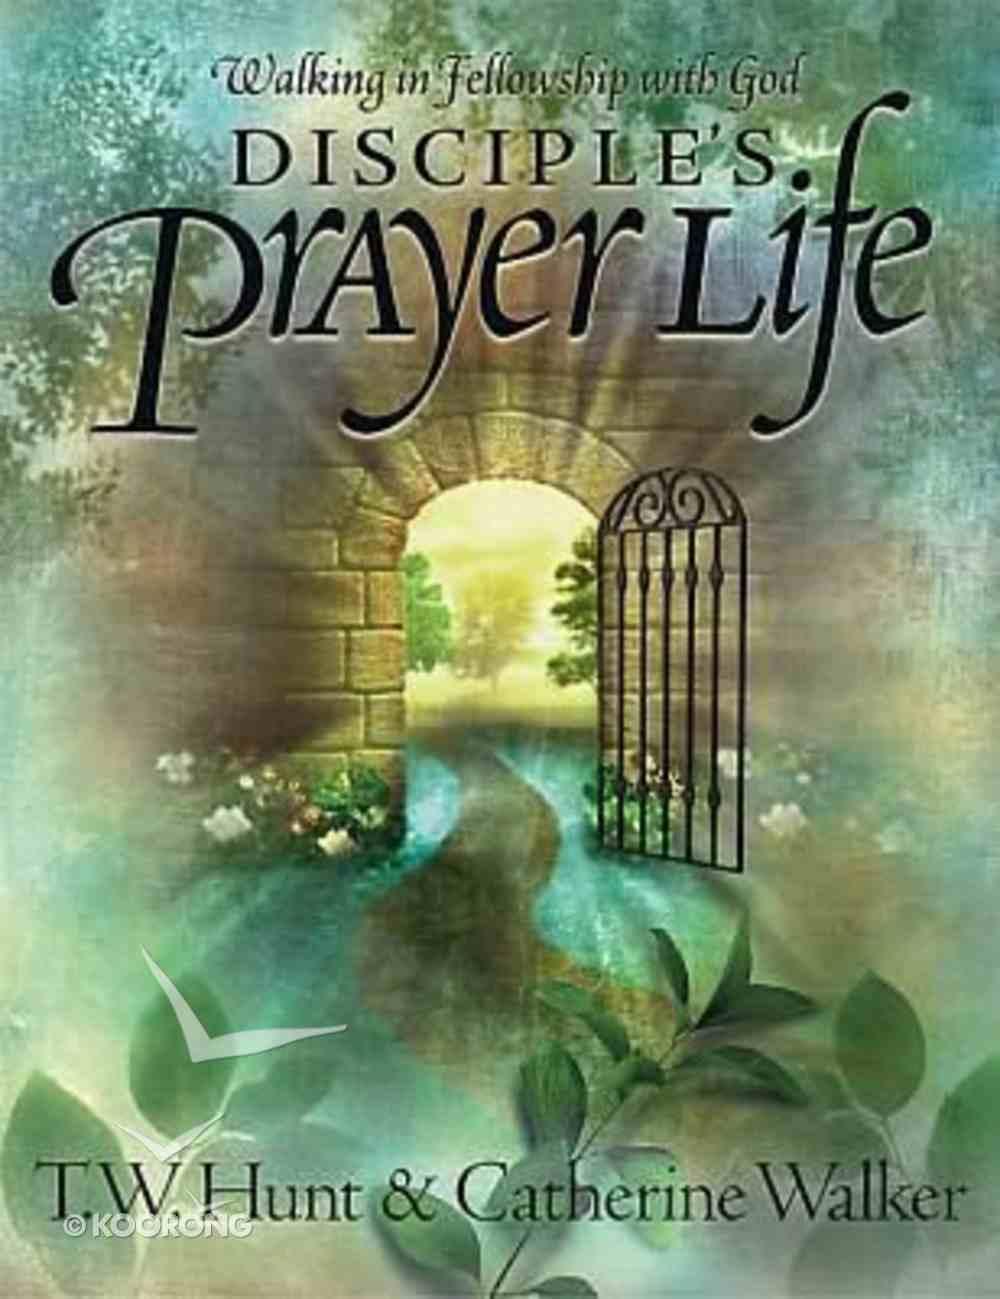 Disciple's Prayer Life Paperback